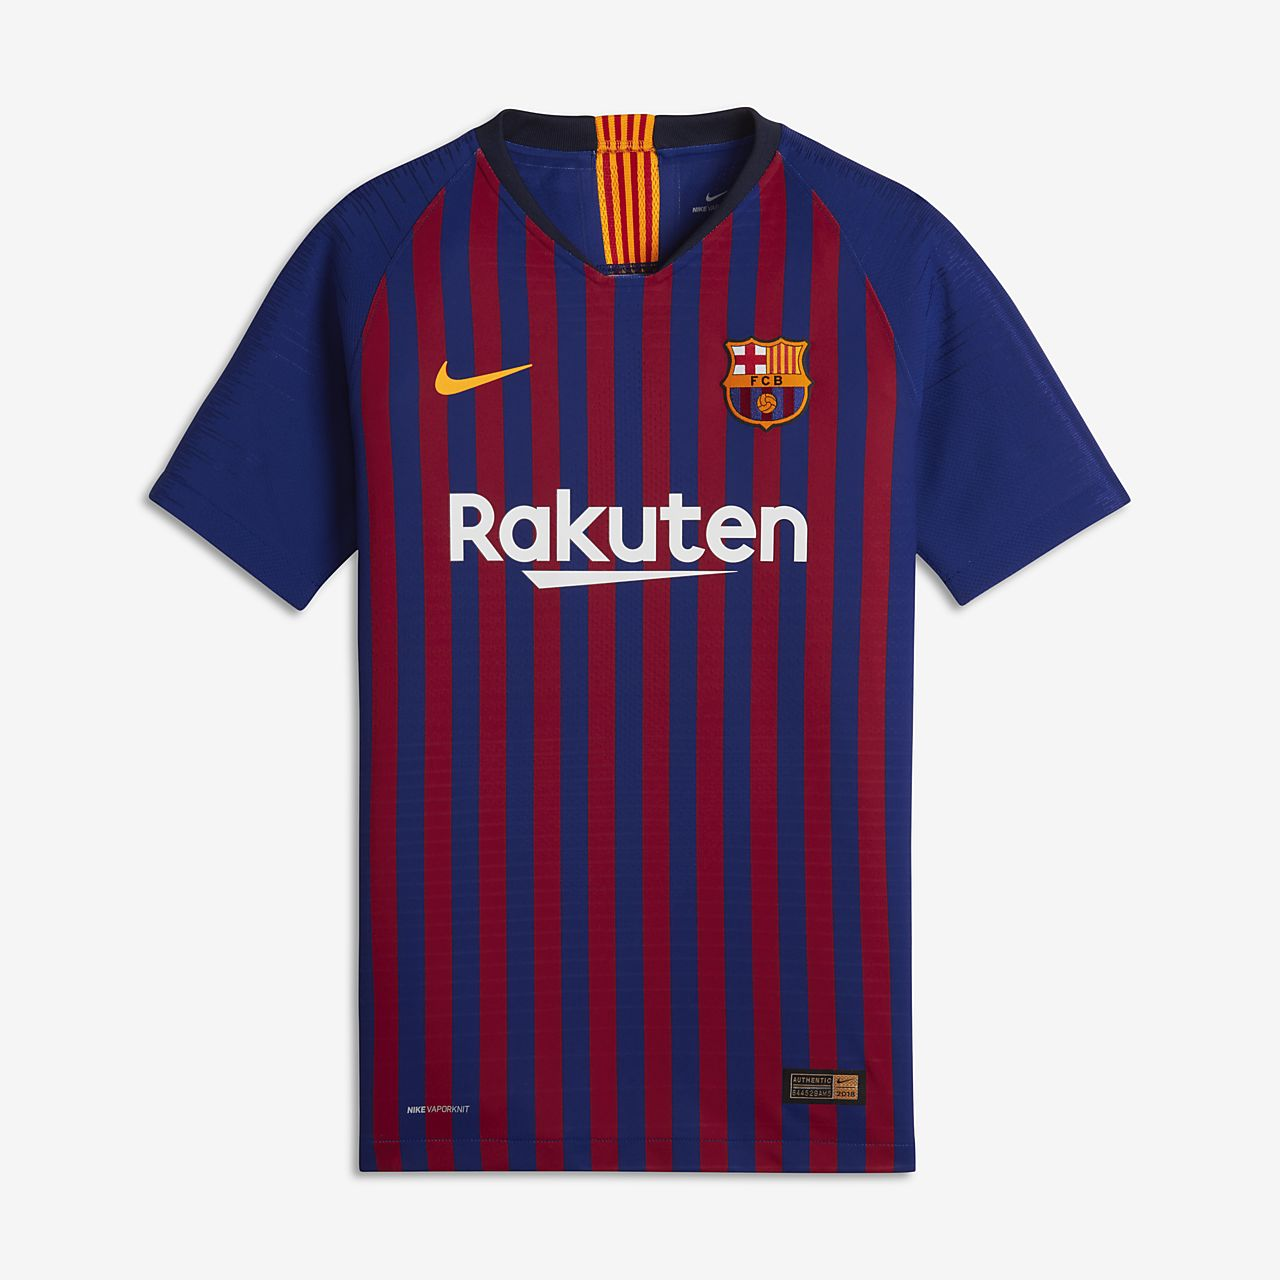 ea62e4a1015 2018 19 FC Barcelona Vapor Match Home Older Kids  Football Shirt ...